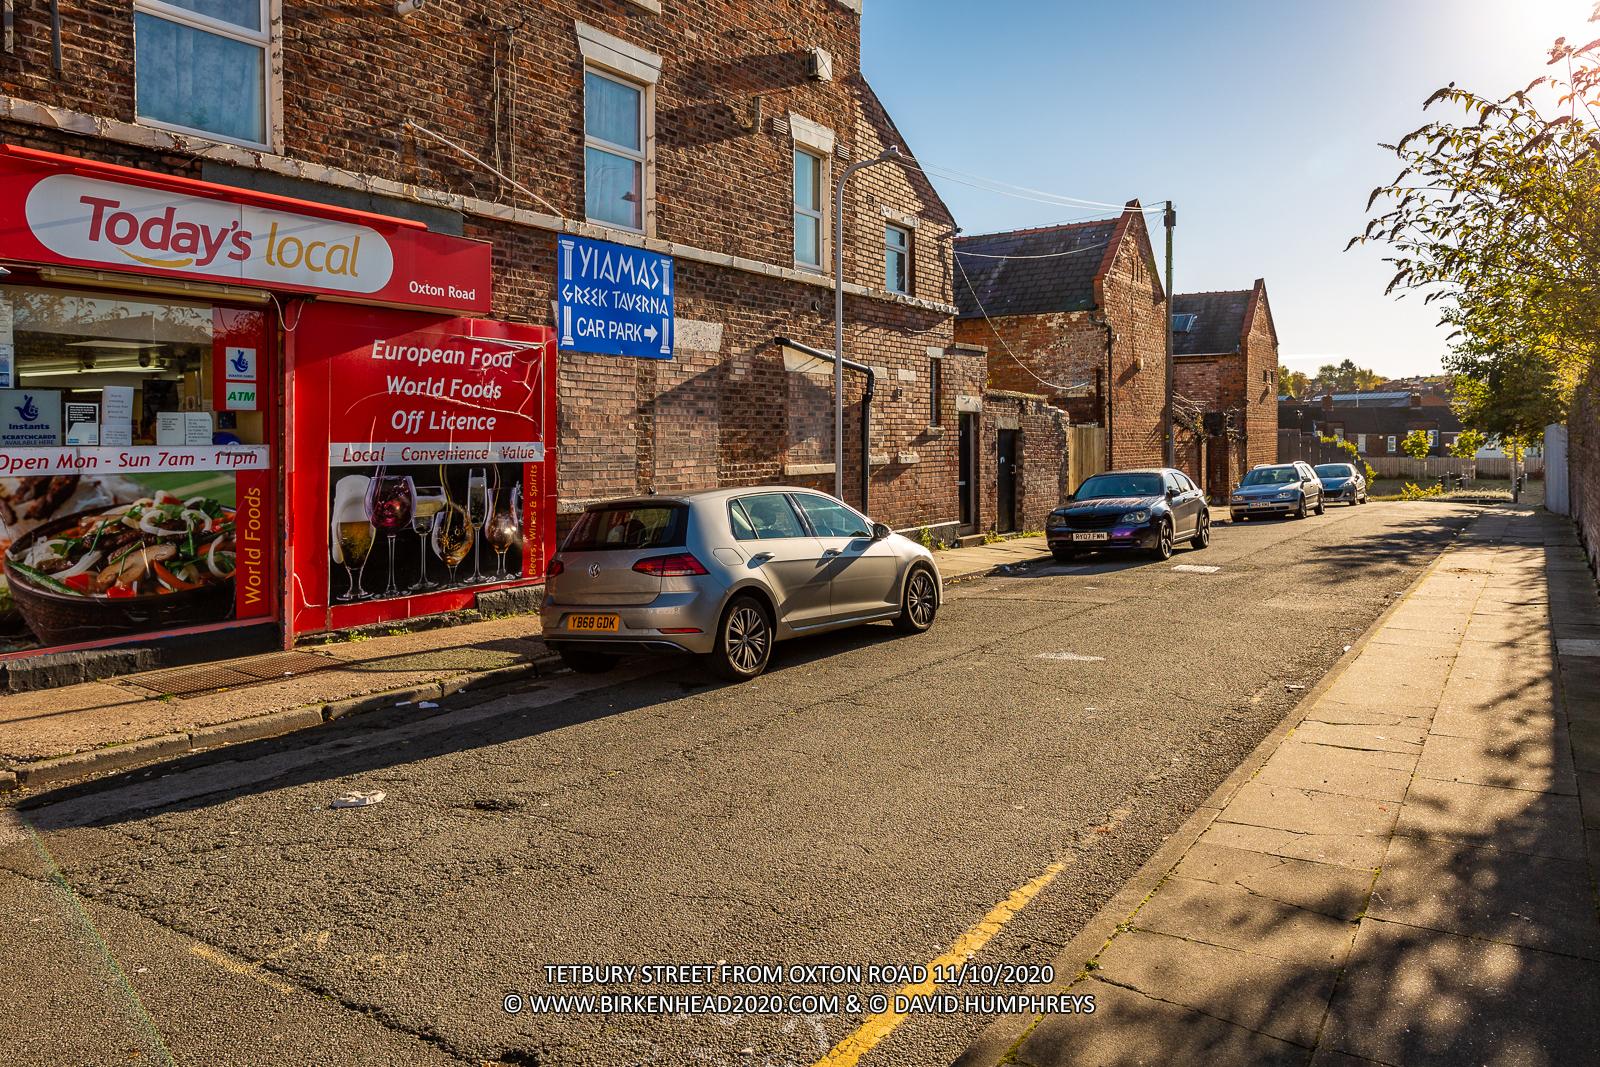 Tetbury Street